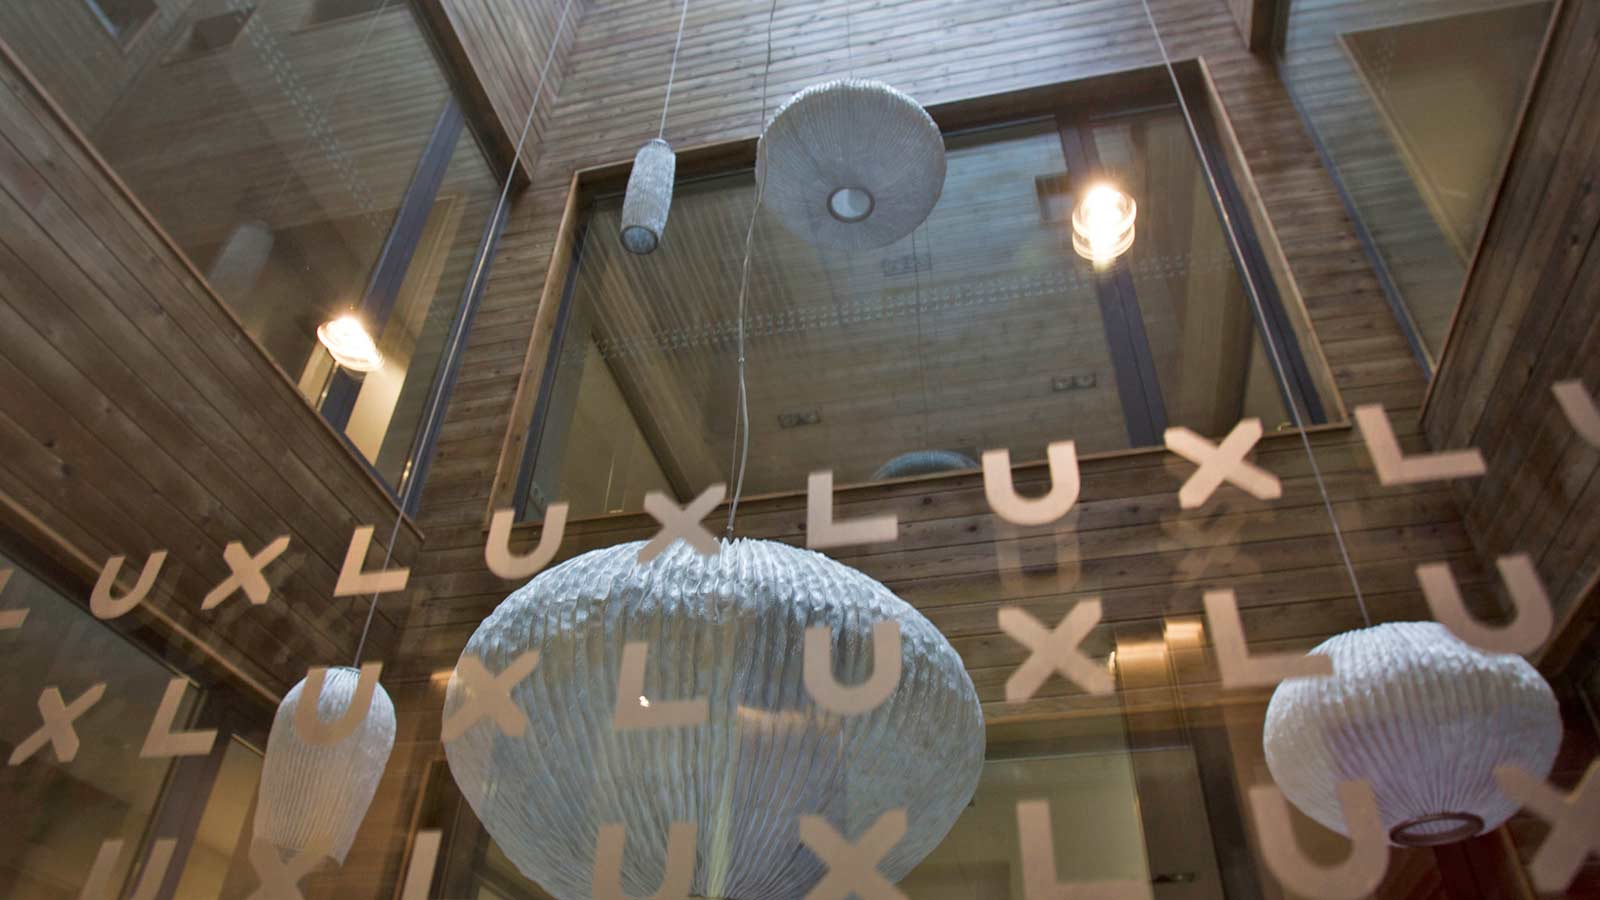 Lux Santiago Hotel